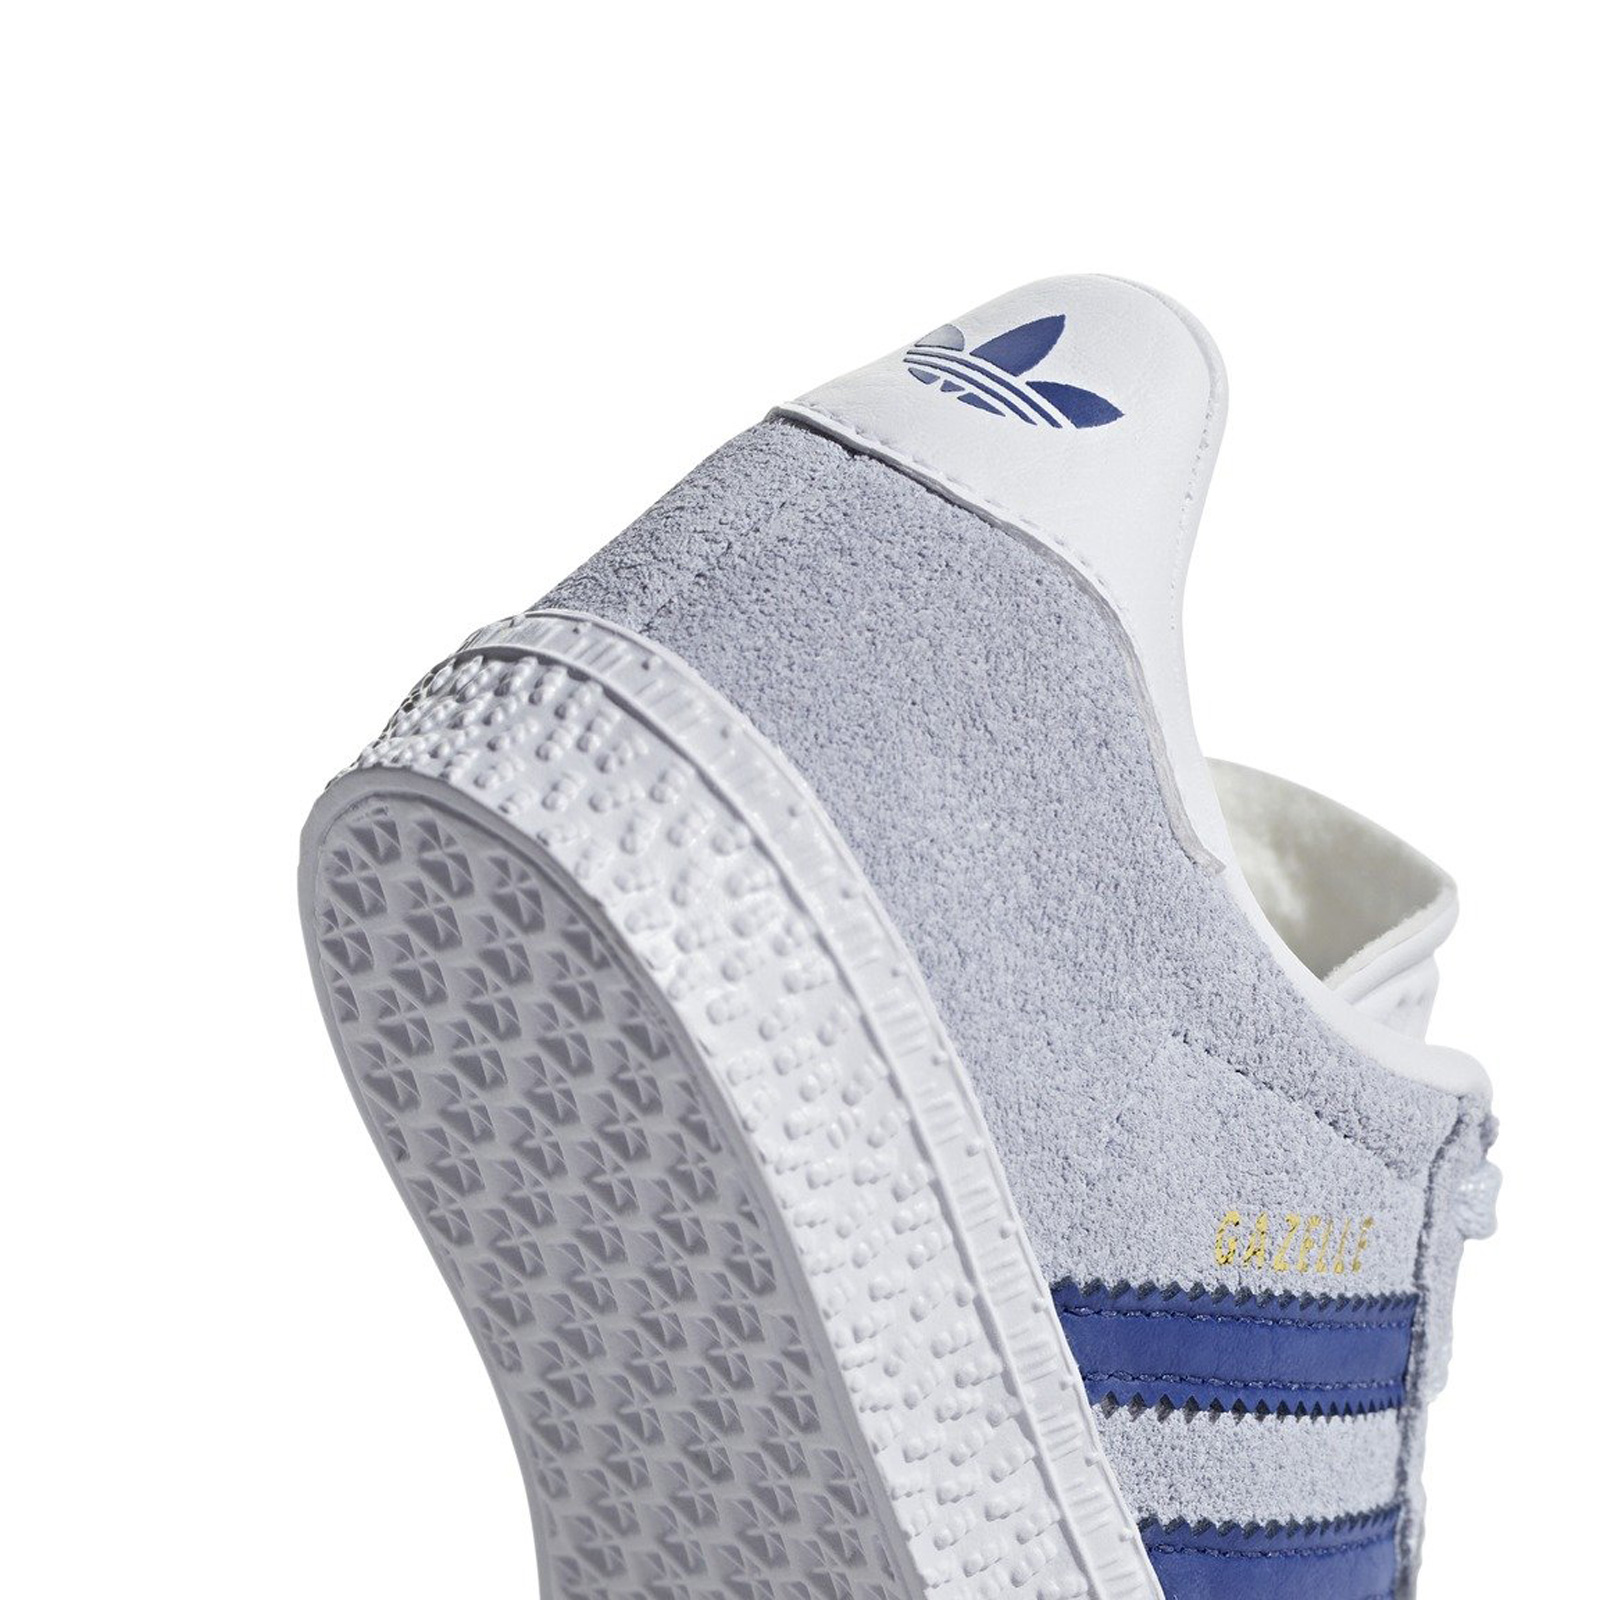 Hellblau Leder Blau Gazelle Sneaker Originals Adidas Kinder